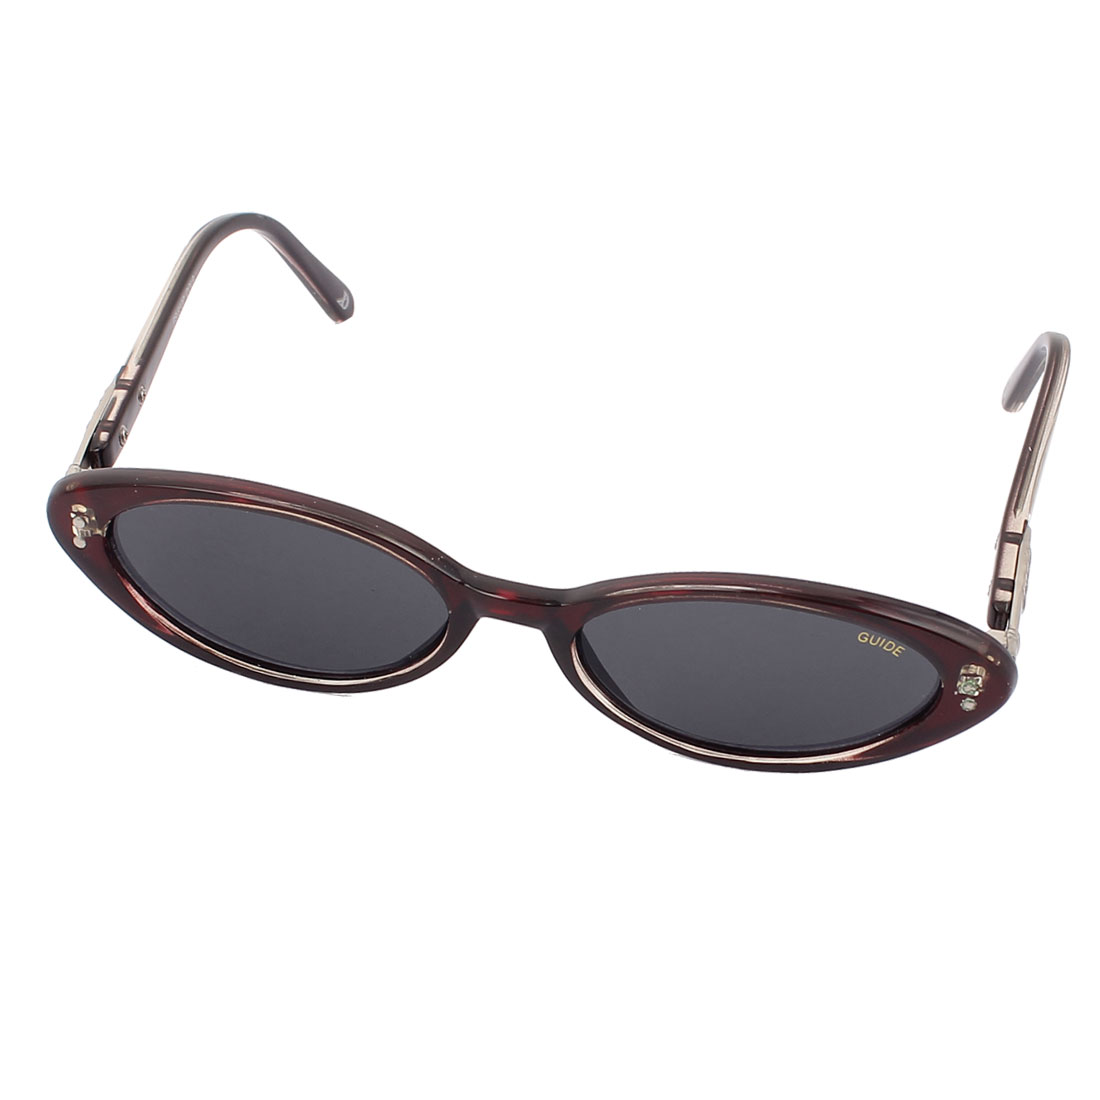 Lady Sleek Black Lens Slim Temple Sunglasses Eyeglasses Eyewear